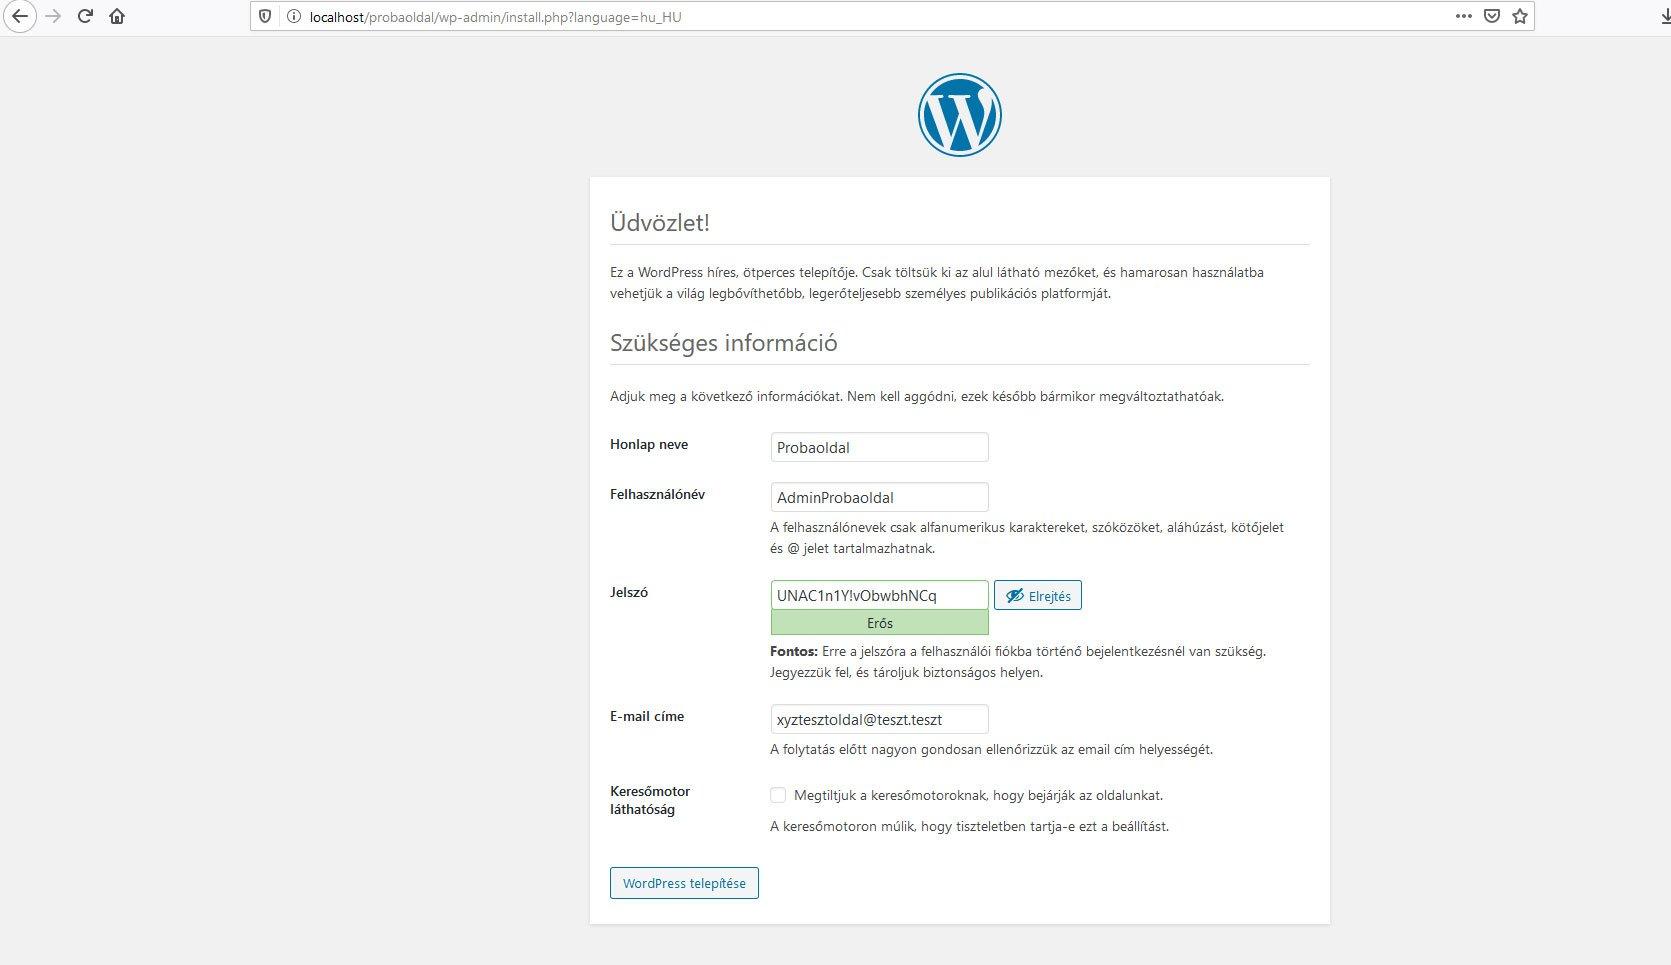 wordpress-telepitese-localhostra-31